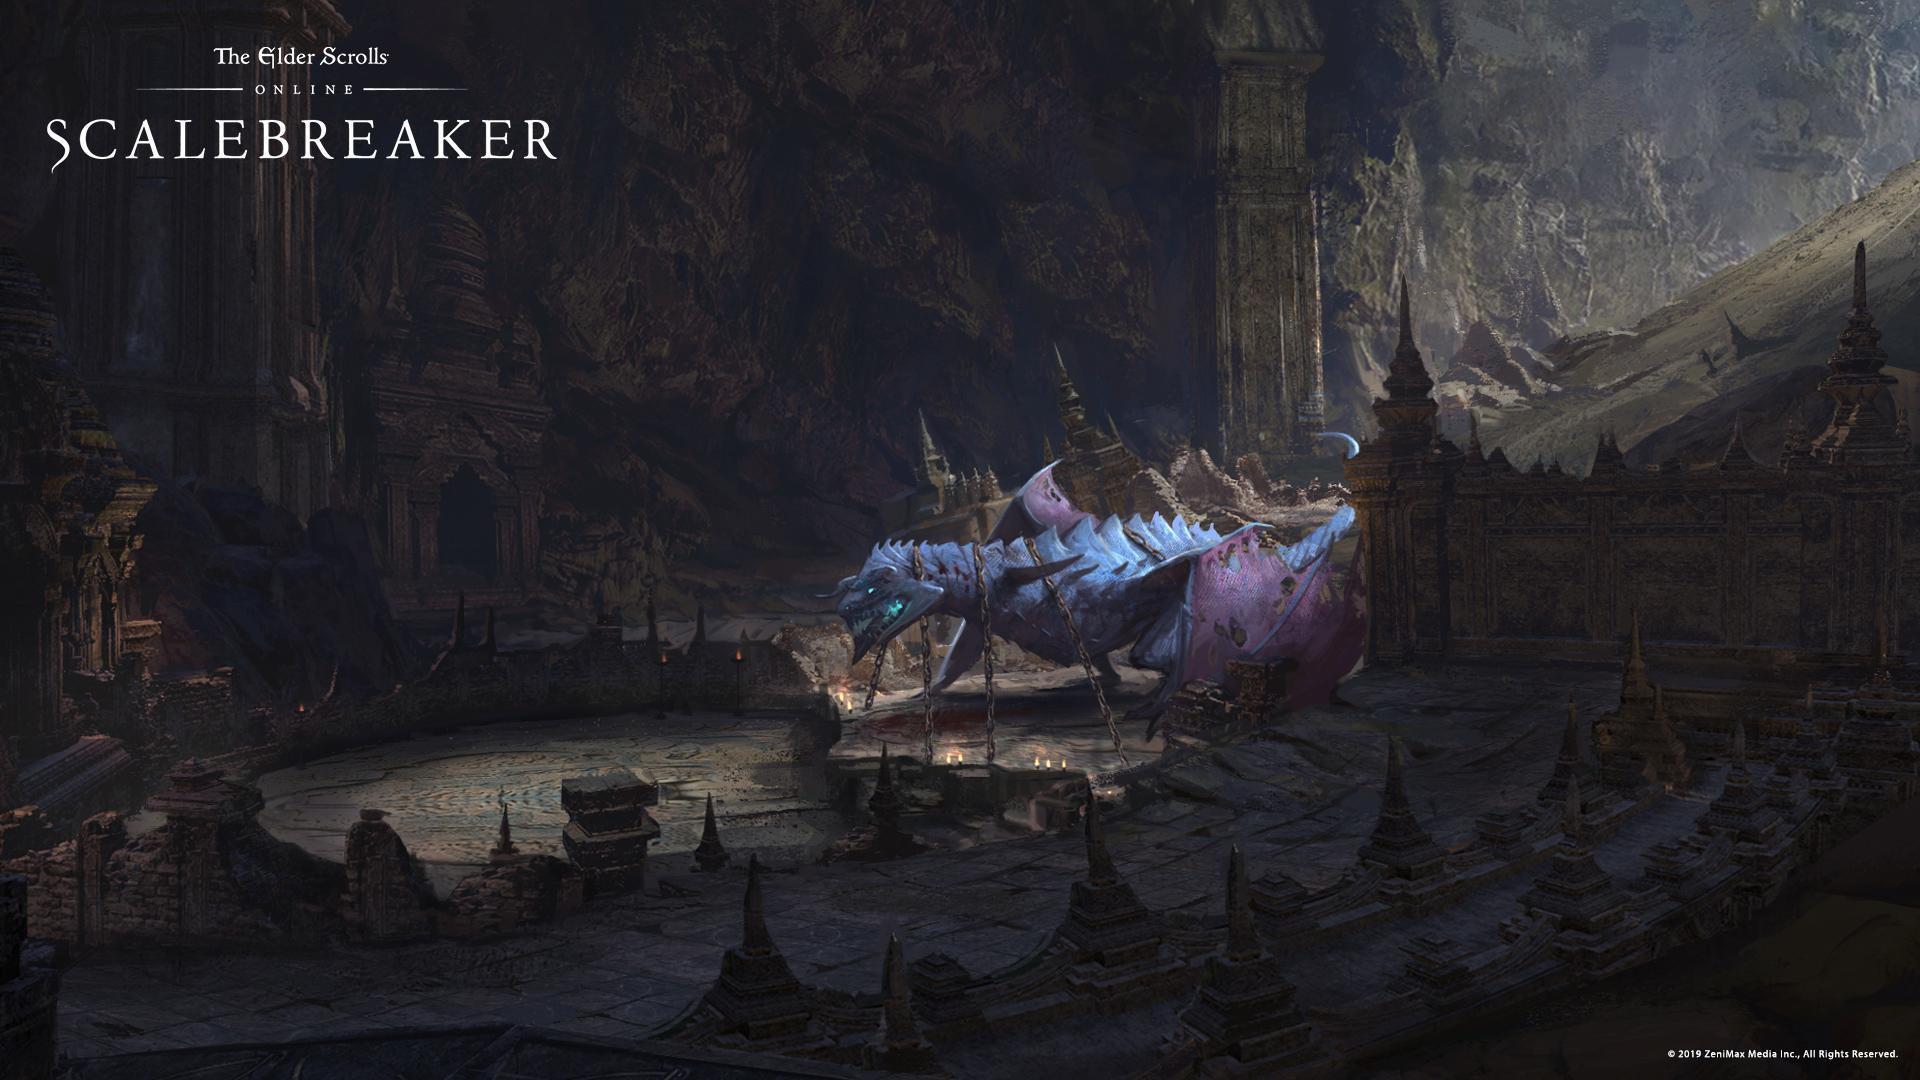 The Elder Scrolls Online: Scalebreaker